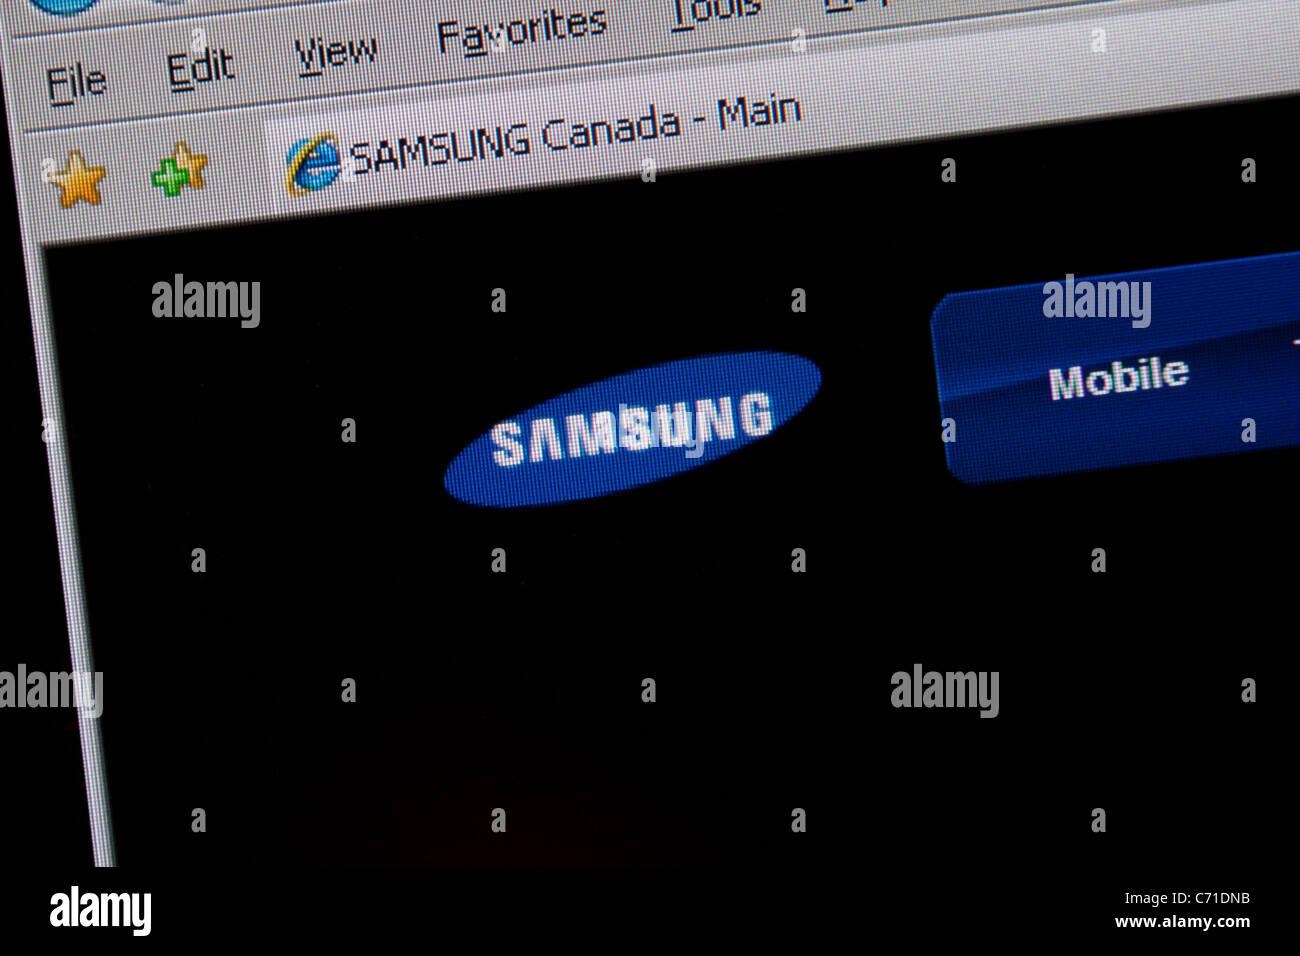 samsung - Stock Image